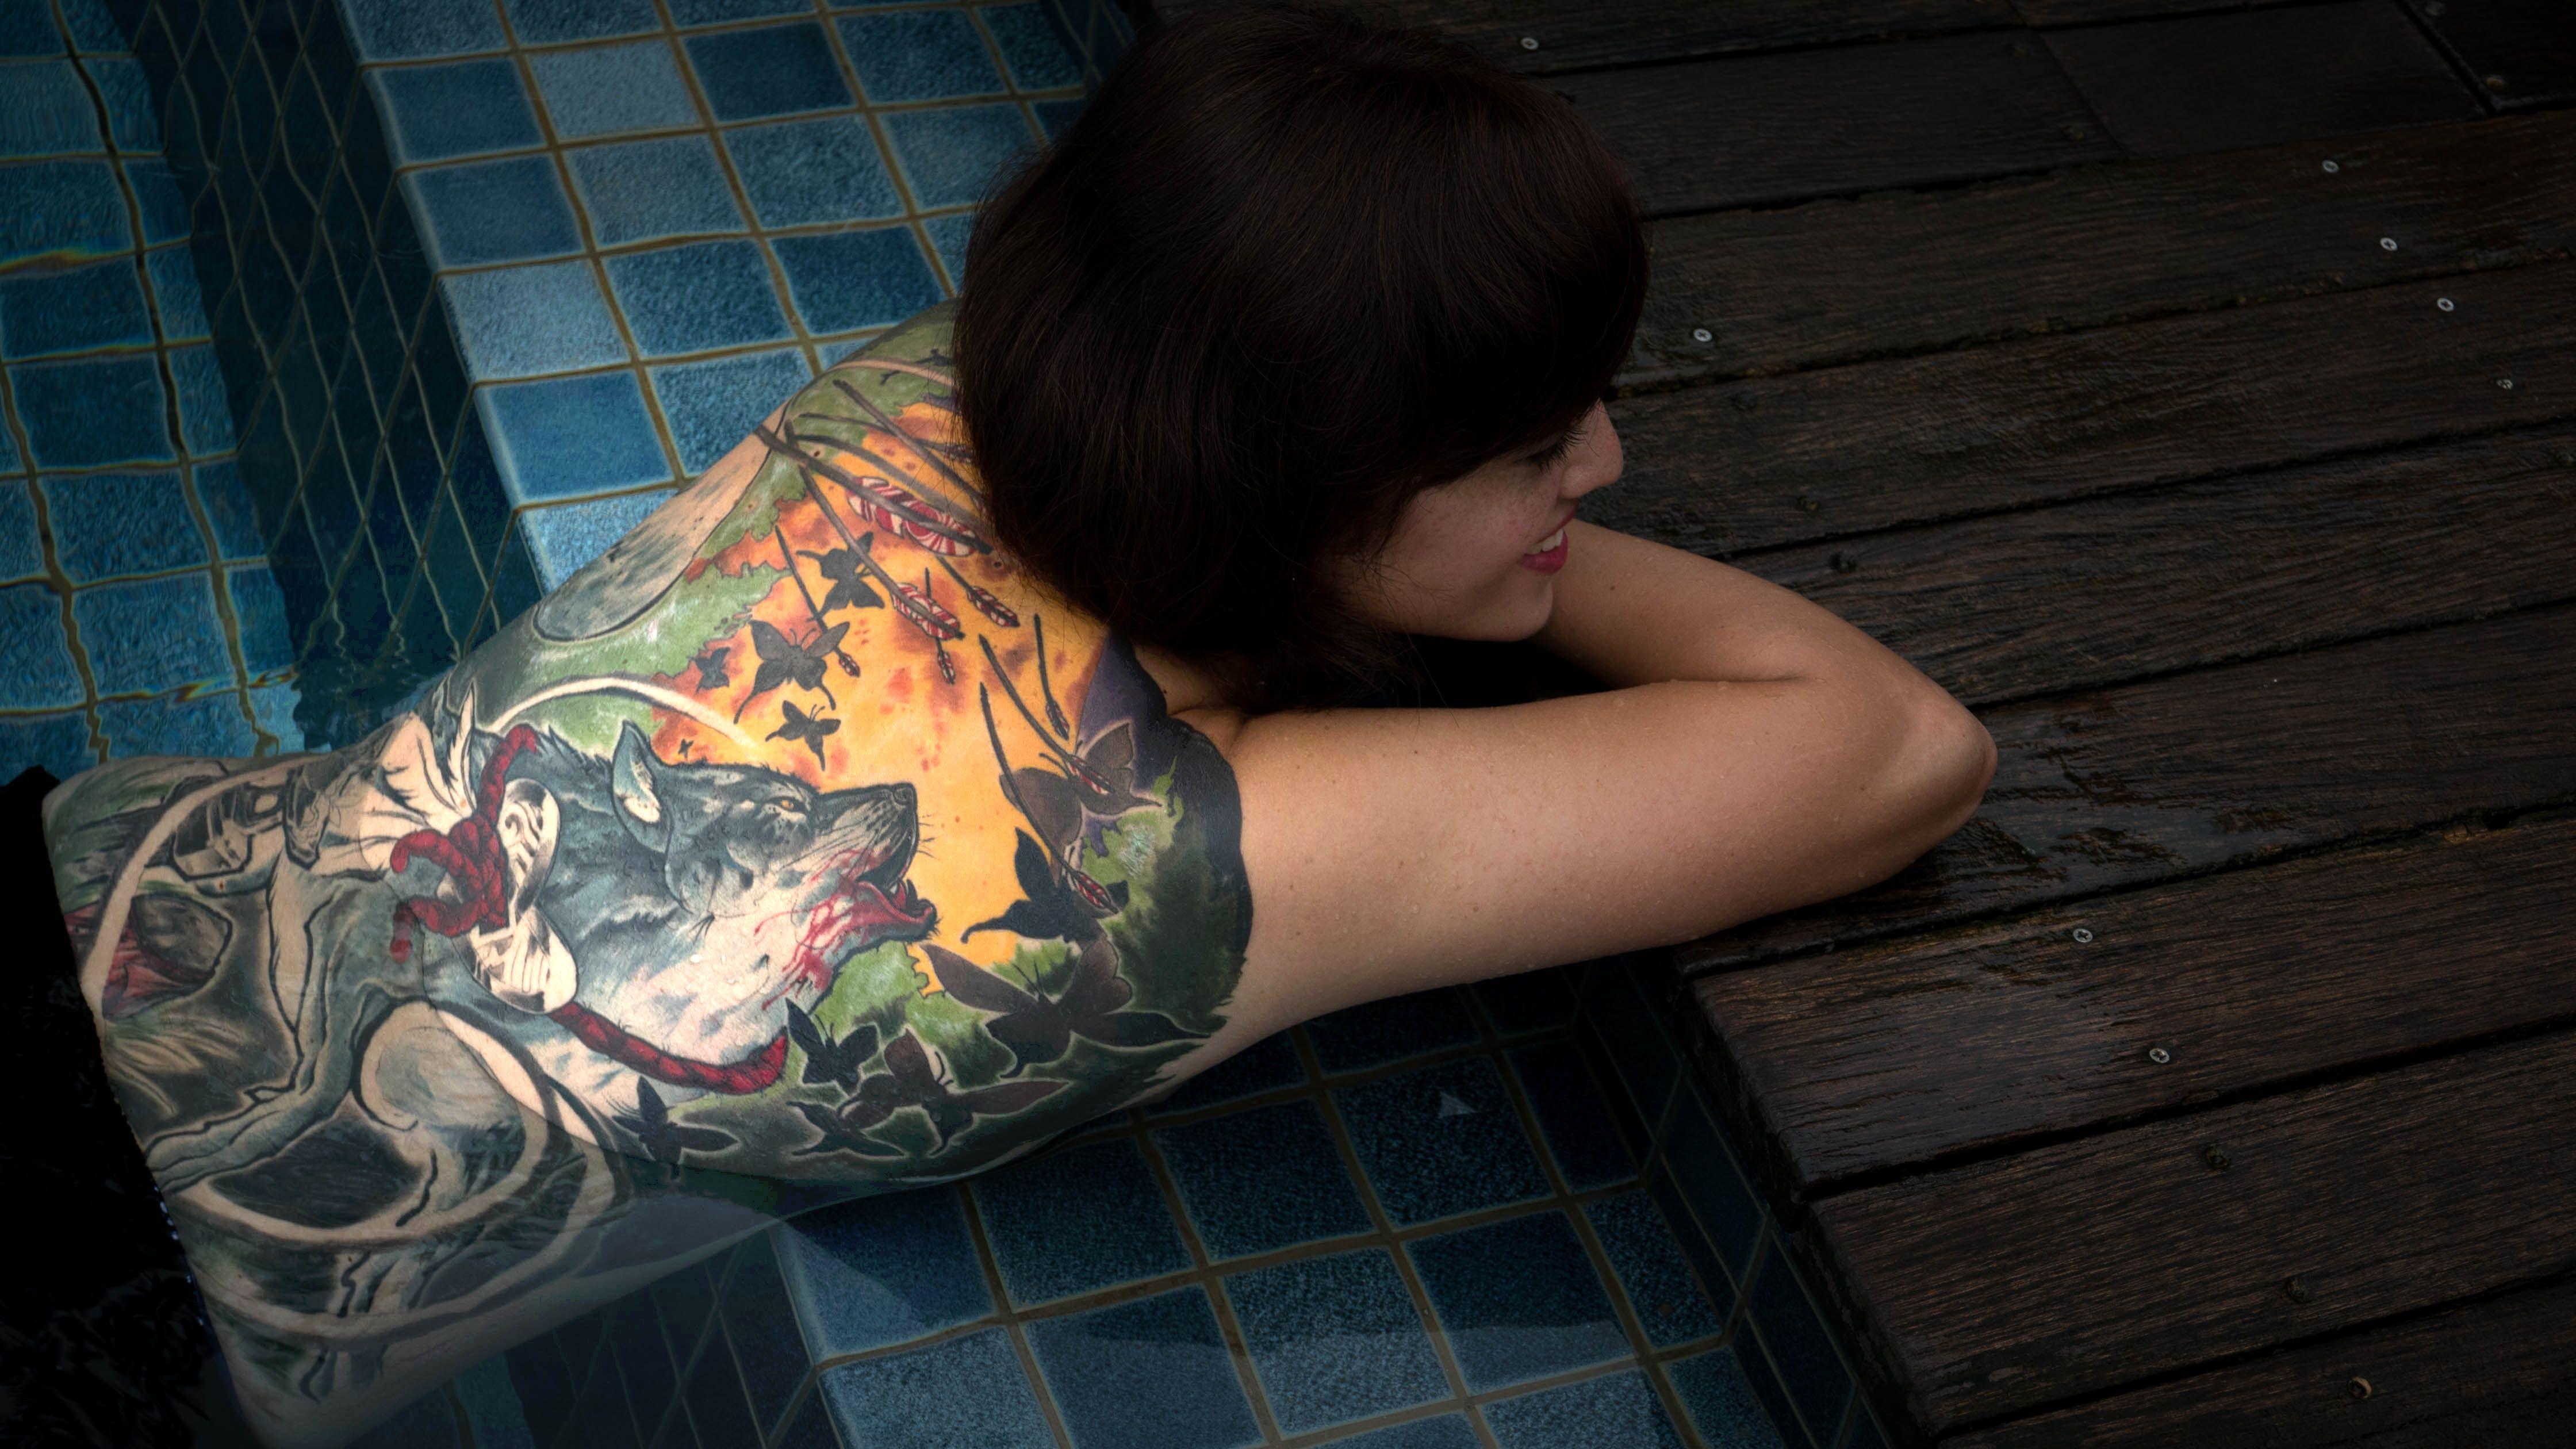 Tattoo Tattoos Ink Inked Inkedup Japanese Japanesetattoo Irezumi Horimono Shisei Wabori Illustra Singapore Tattoo Comic Book Tattoo Japanese Tattoo